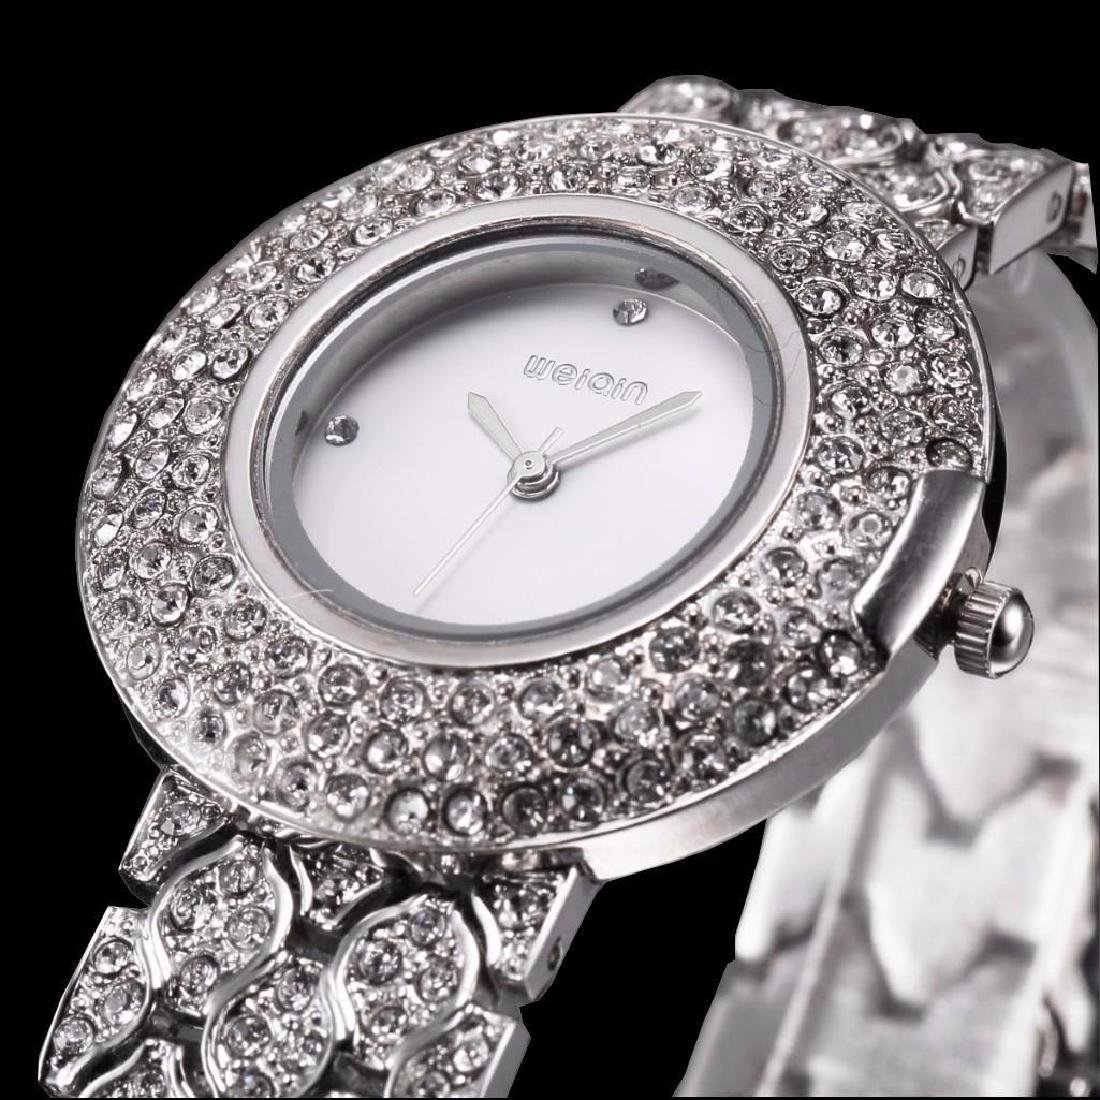 Women's Stainless Steel & Crystal Quartz Bracelet Wrist